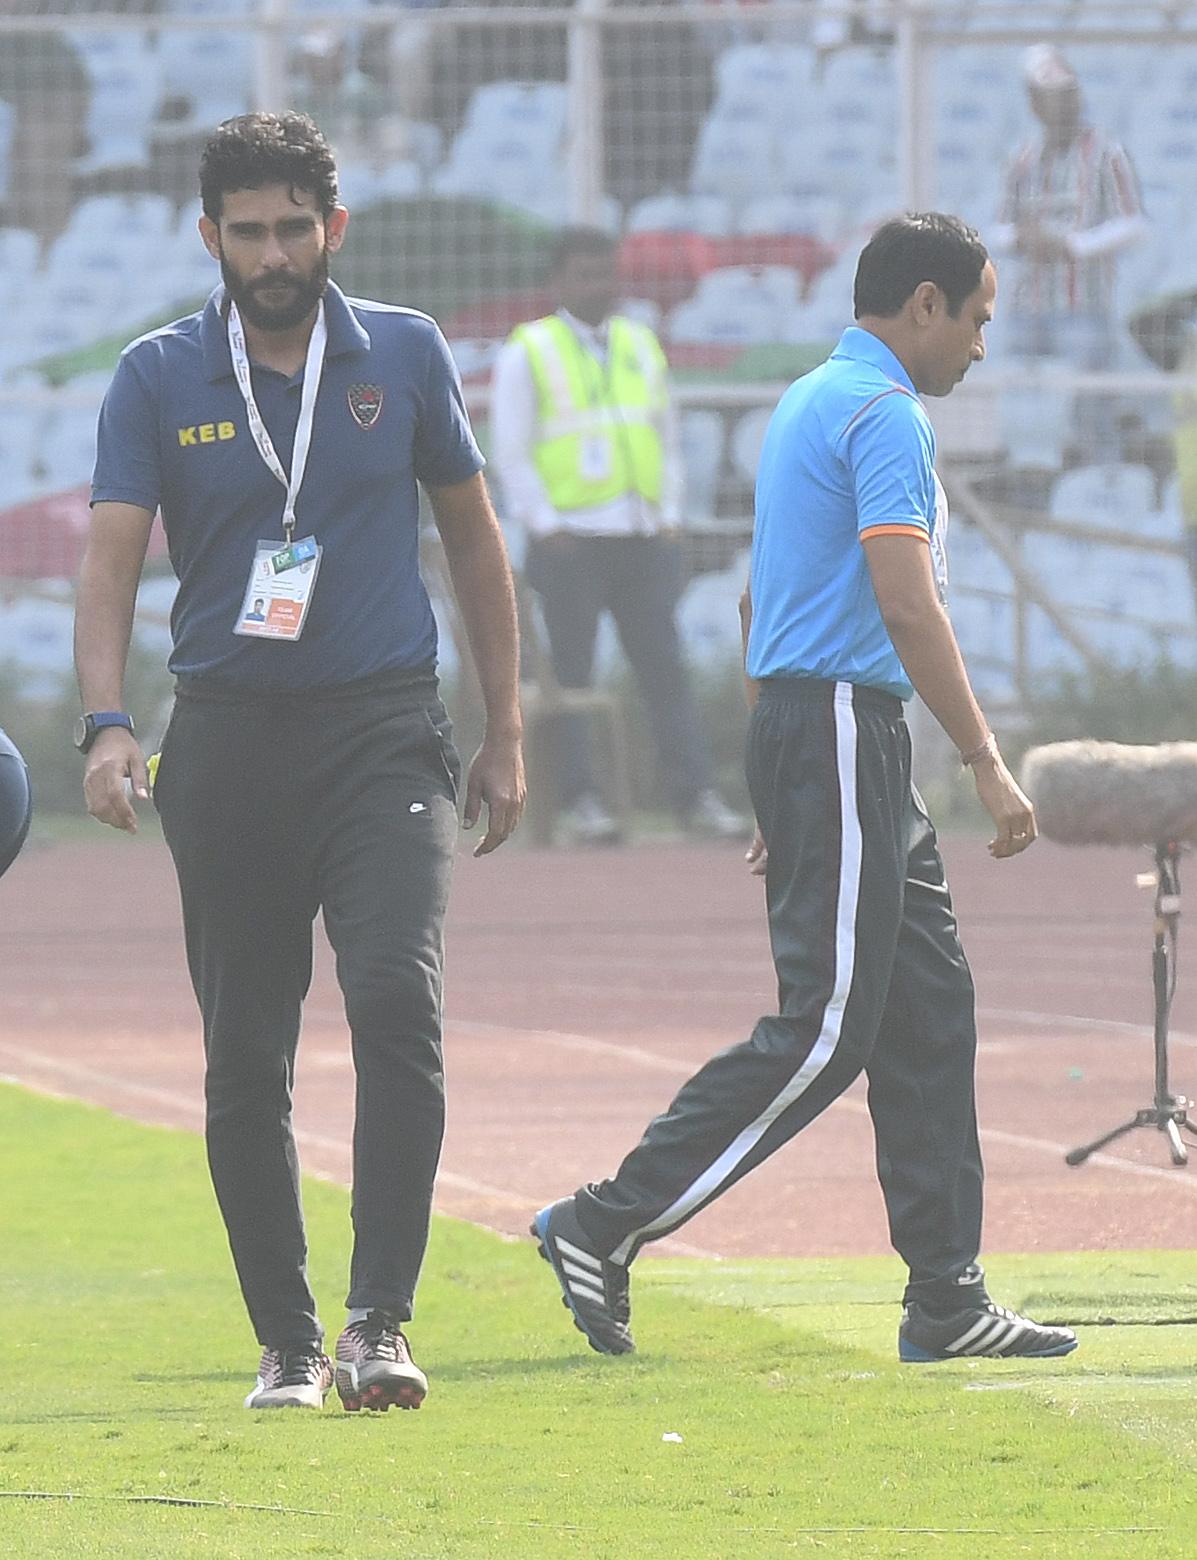 Khalid Jamil Sankar Lal Chakraborty East Bengal Mohun Bagan 2017-18 I-League Kolkata Derby